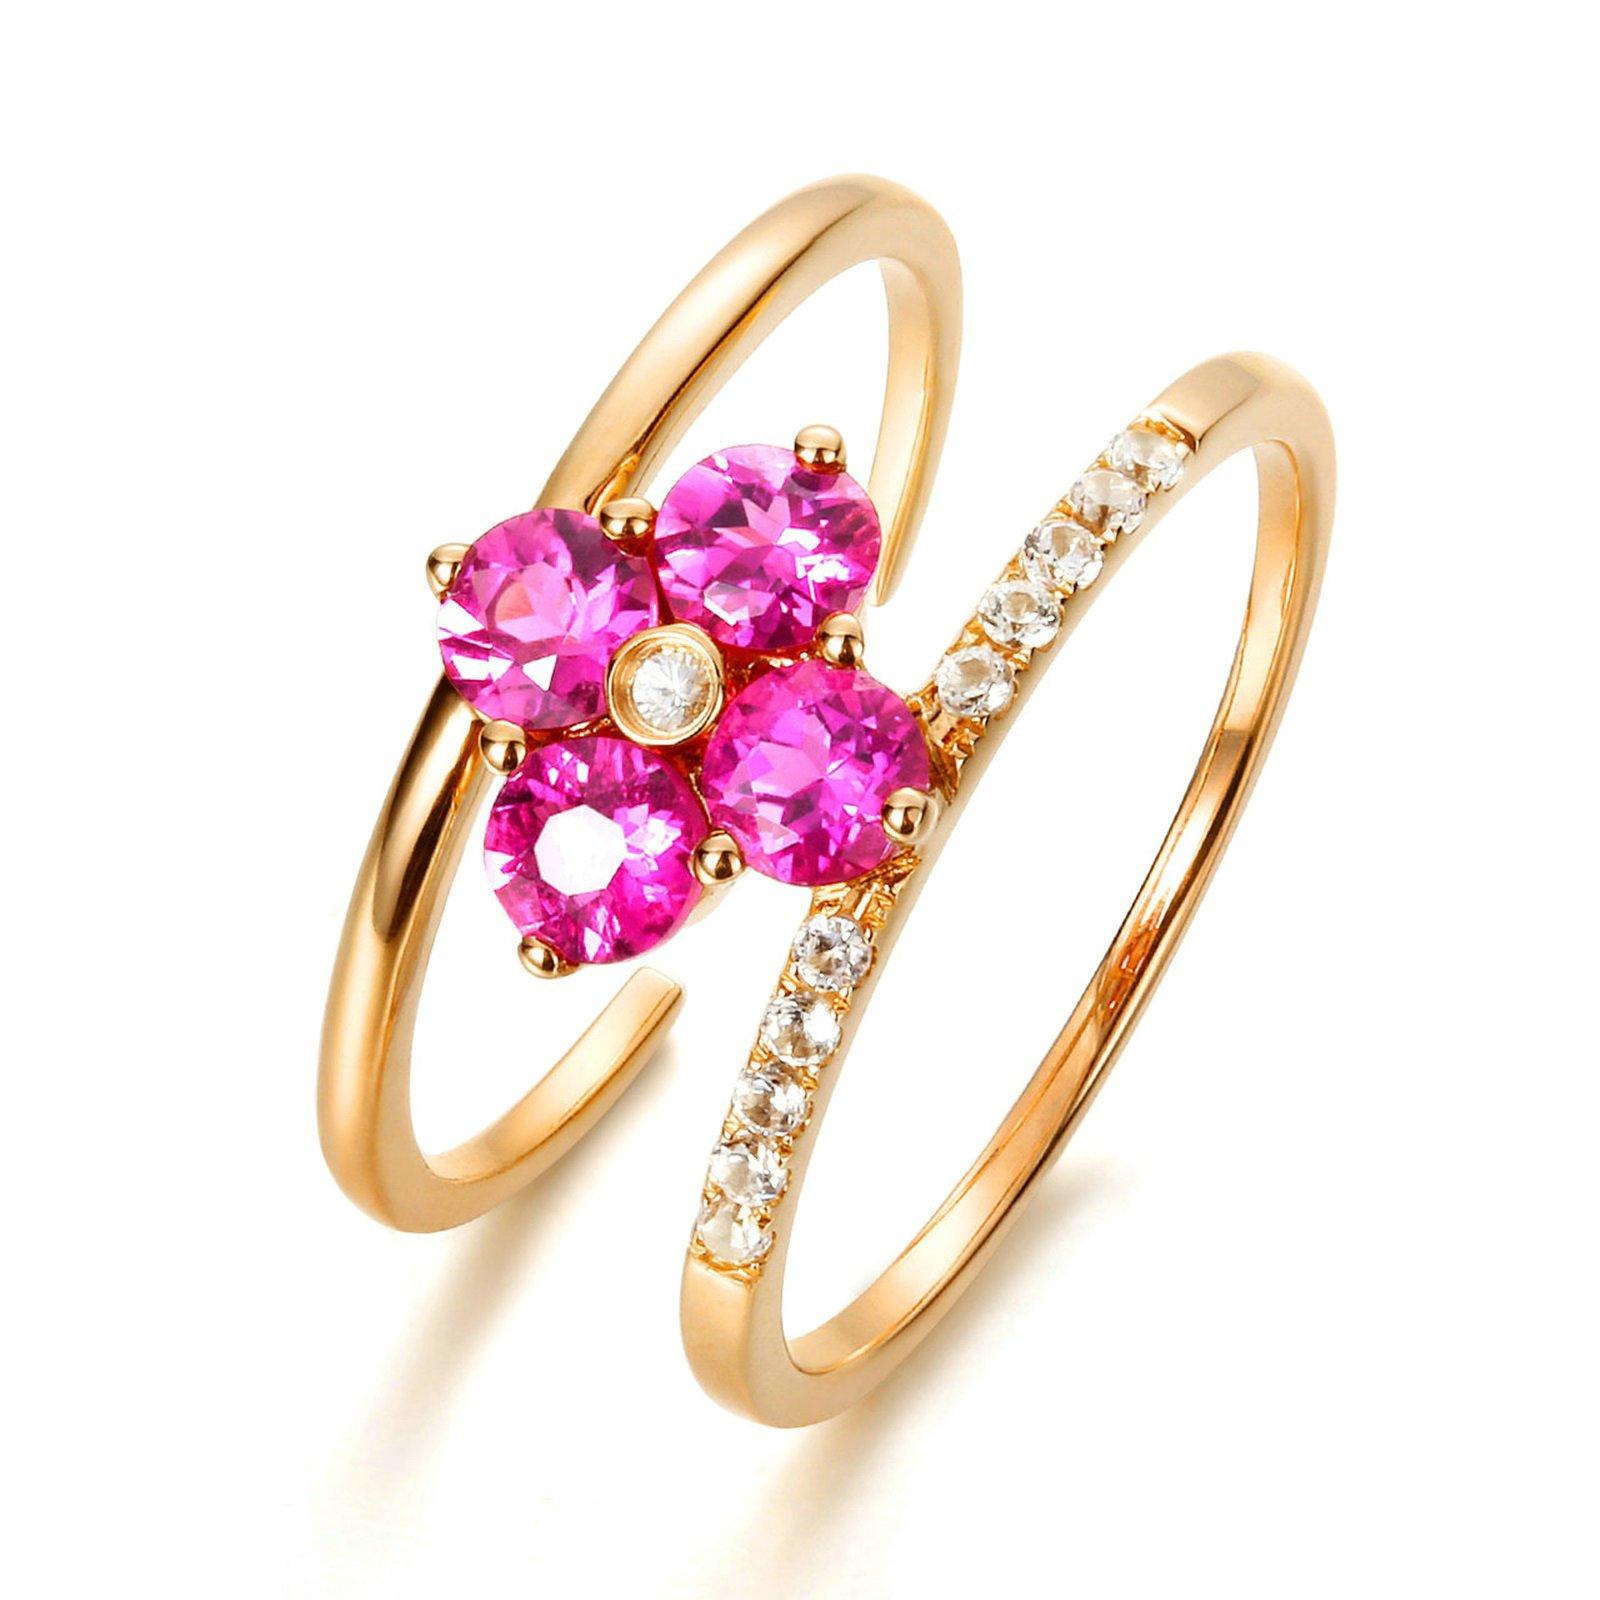 18K Gold Ring(Au750),0.7Ct Pink Tourmaline Flower Ring Wedding Engagement Ring for Women Bride Size 6.5